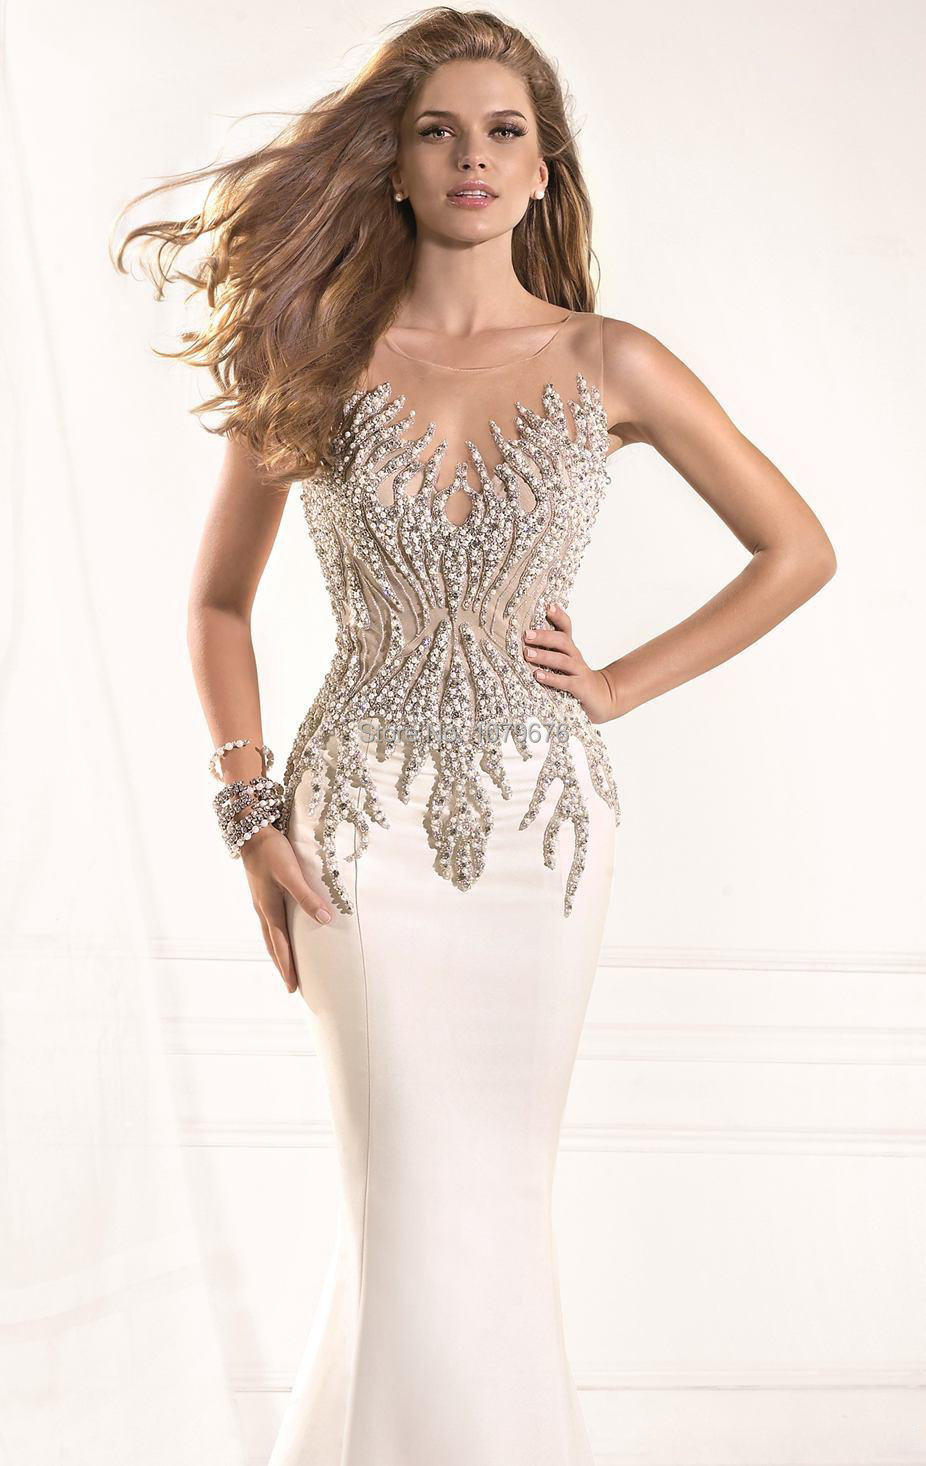 Images of Best Prom Dress Brands - Reikian